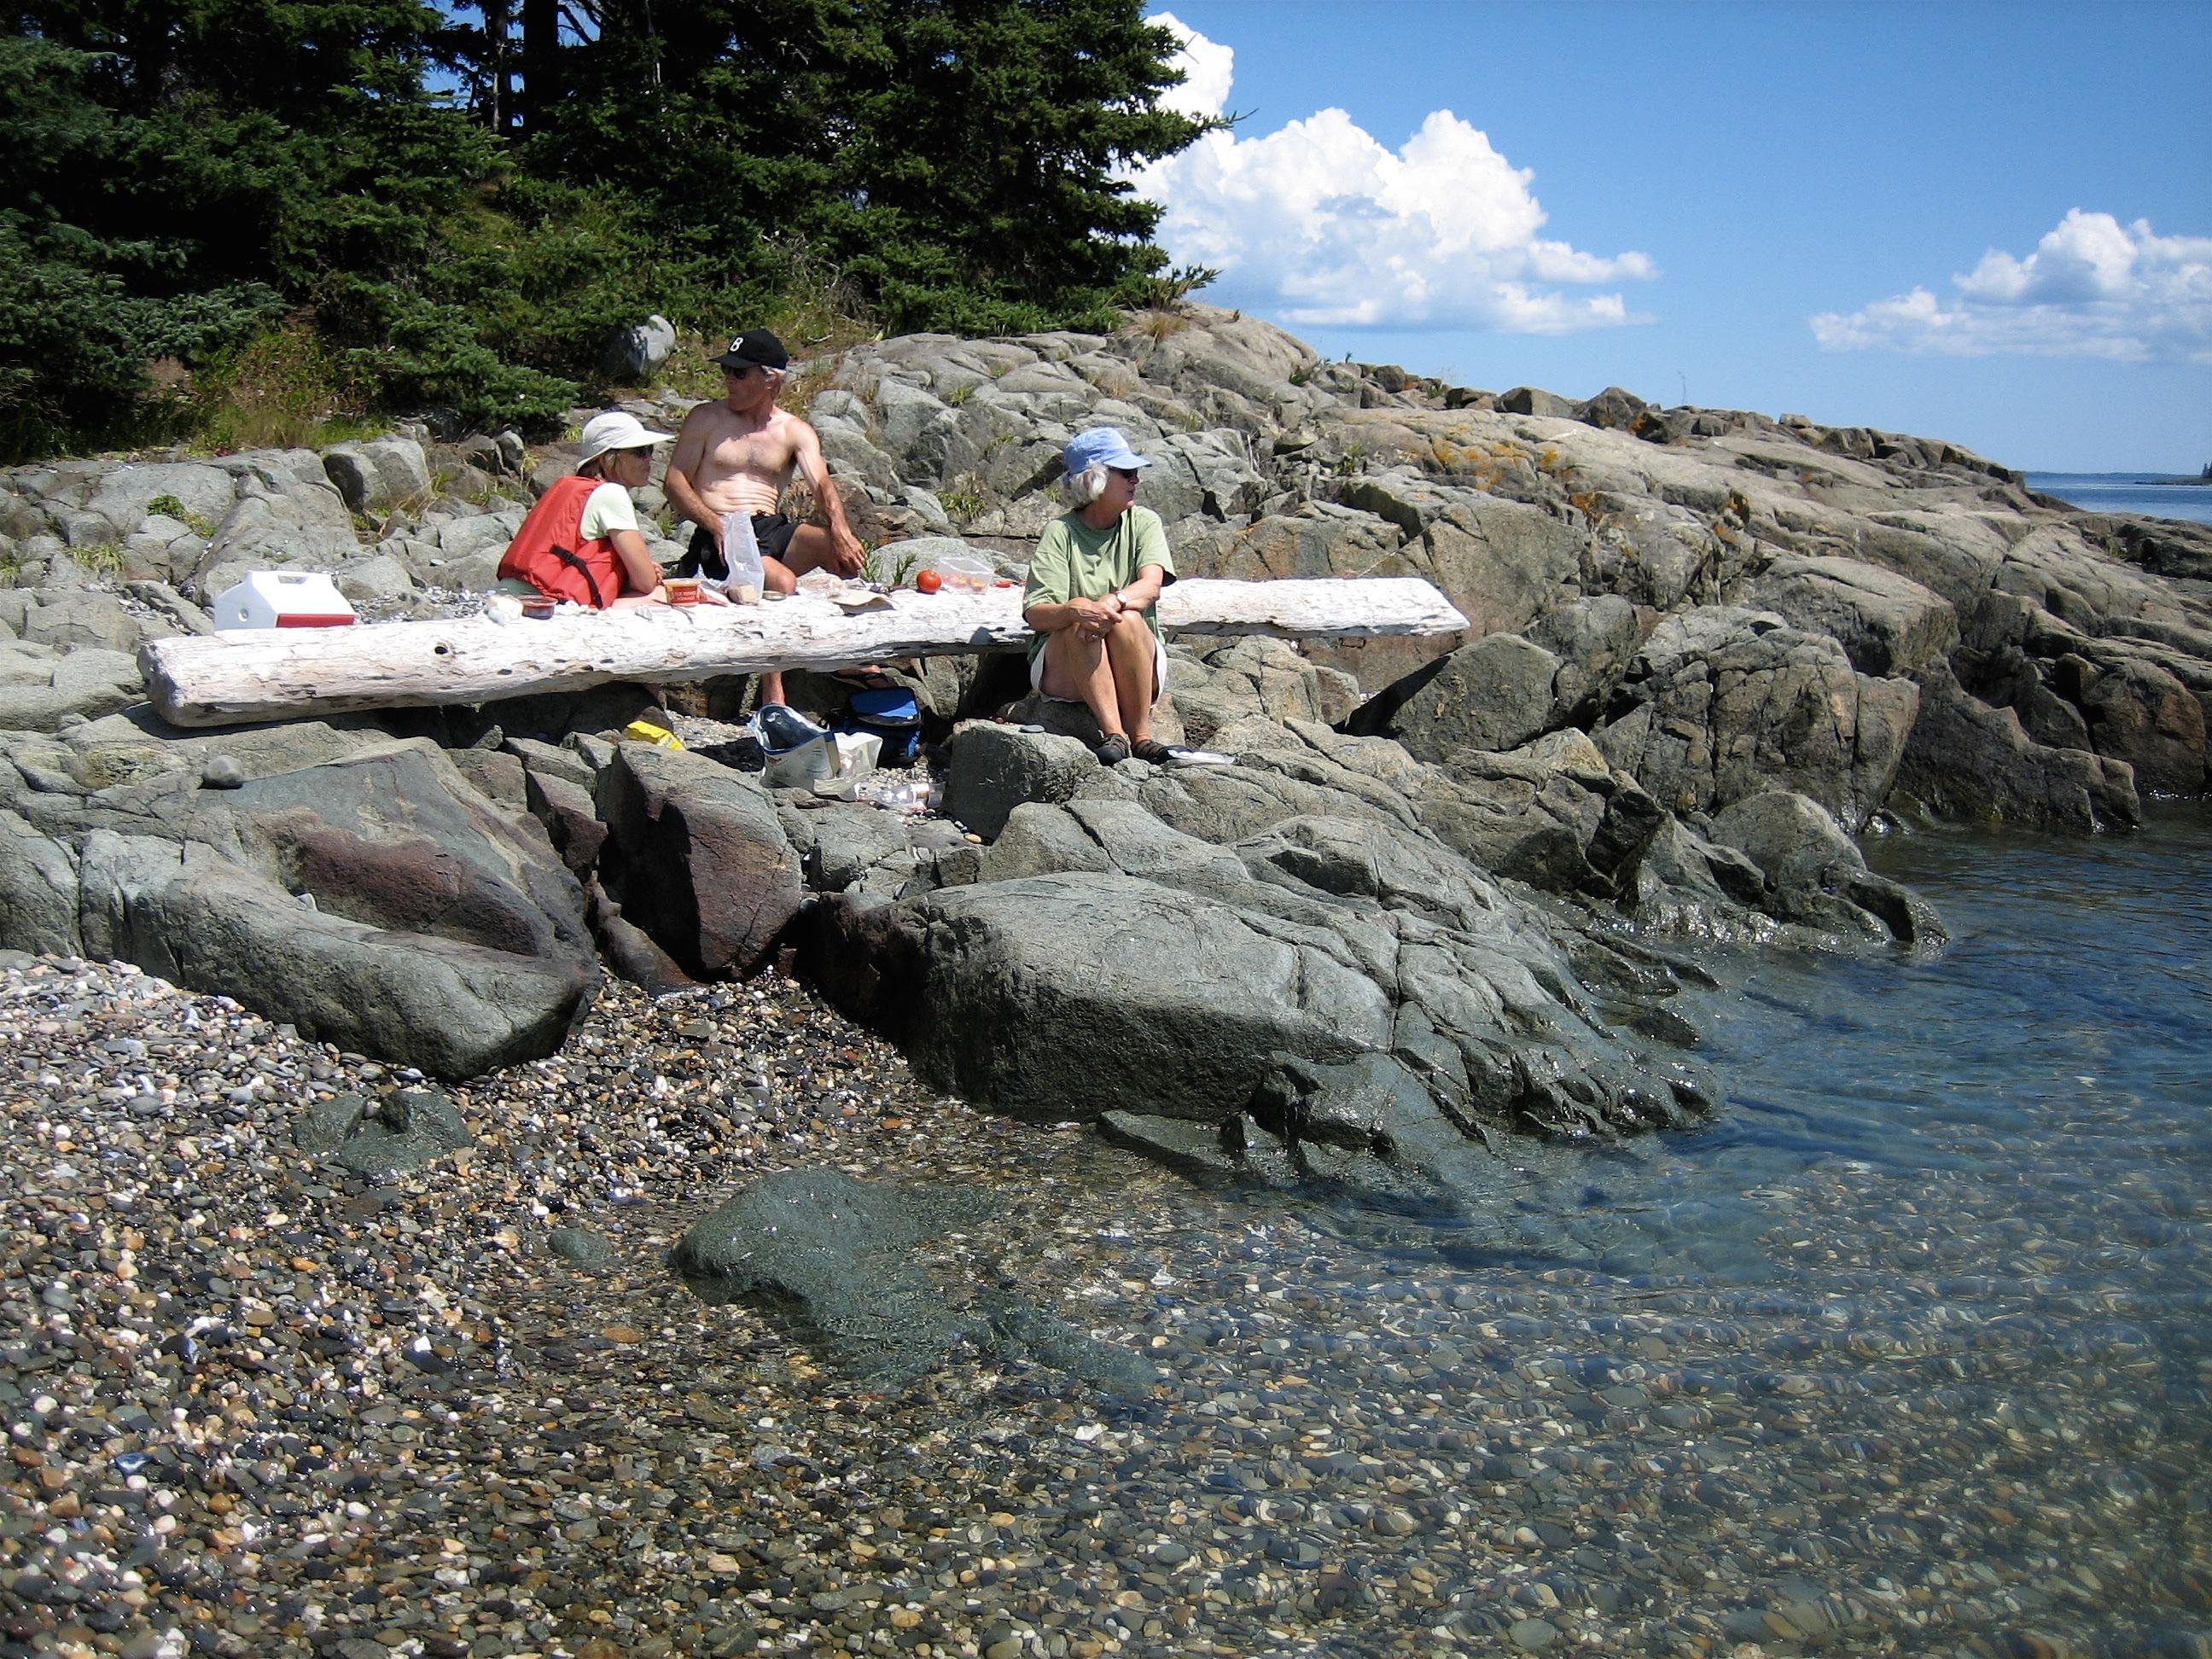 Hiram Blake Camp, Harborside, Maine | Island picnic